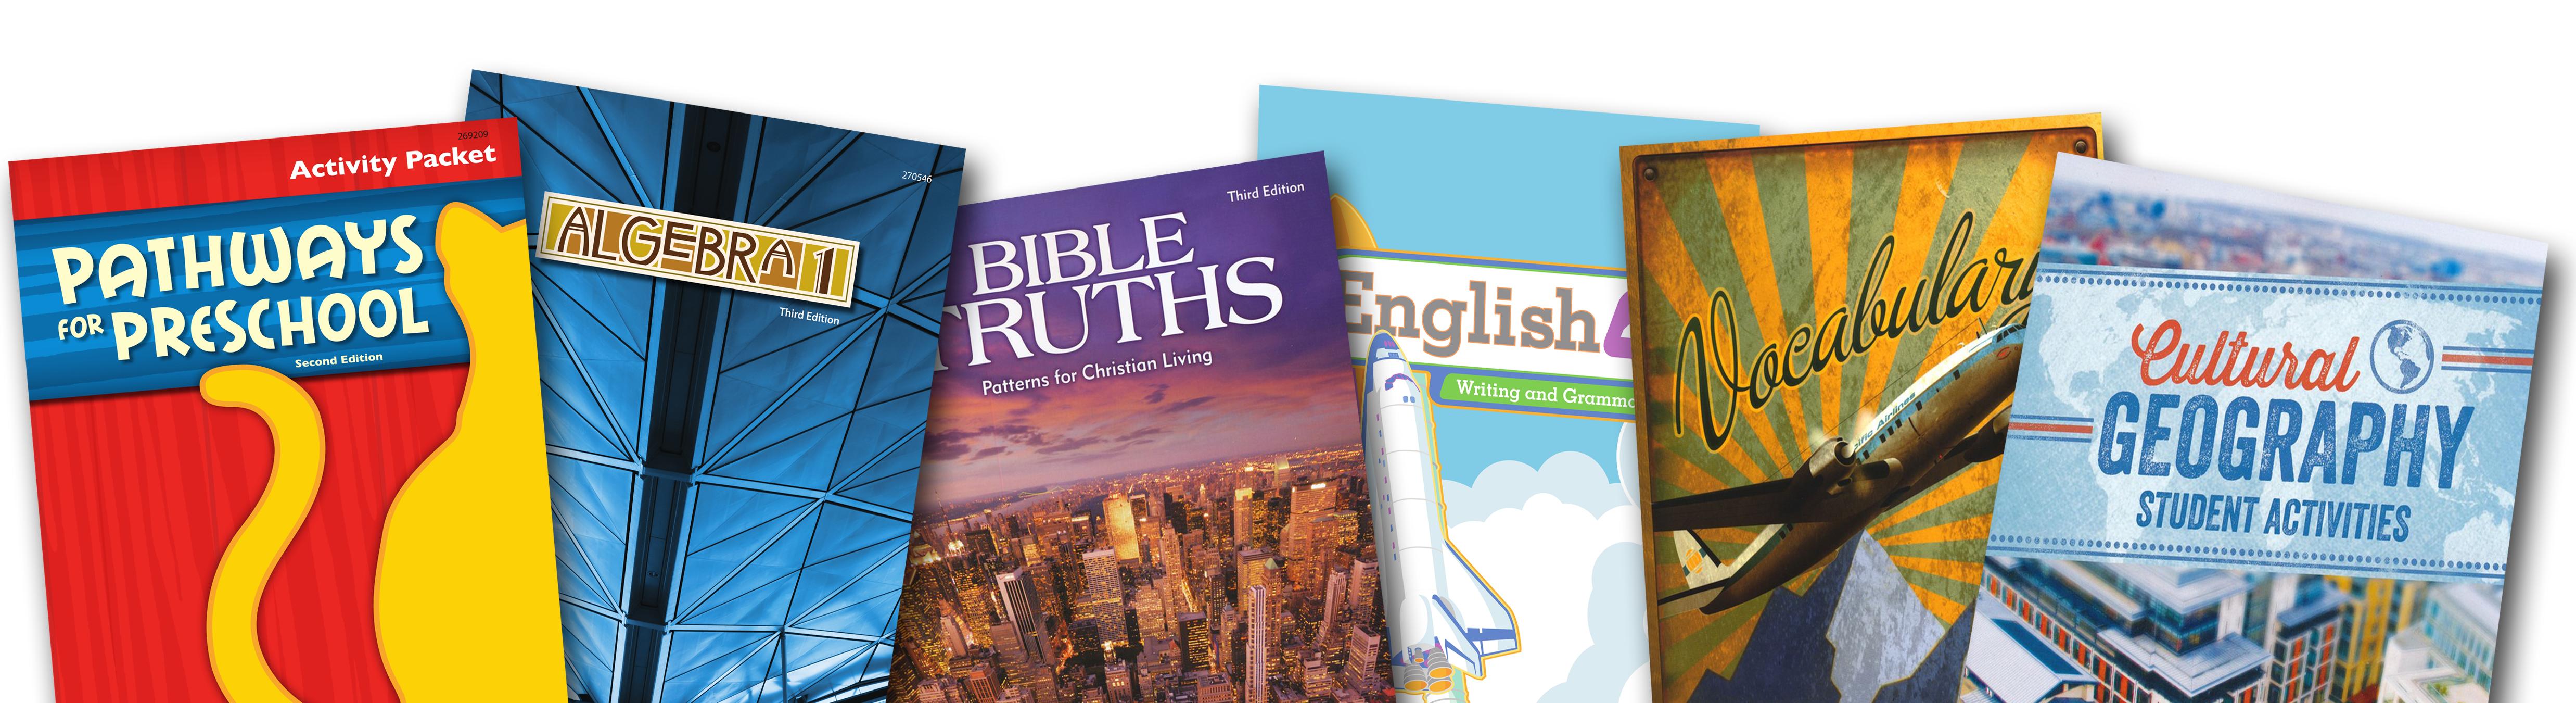 Everlearn Technologies Inc English Writing And Grammar